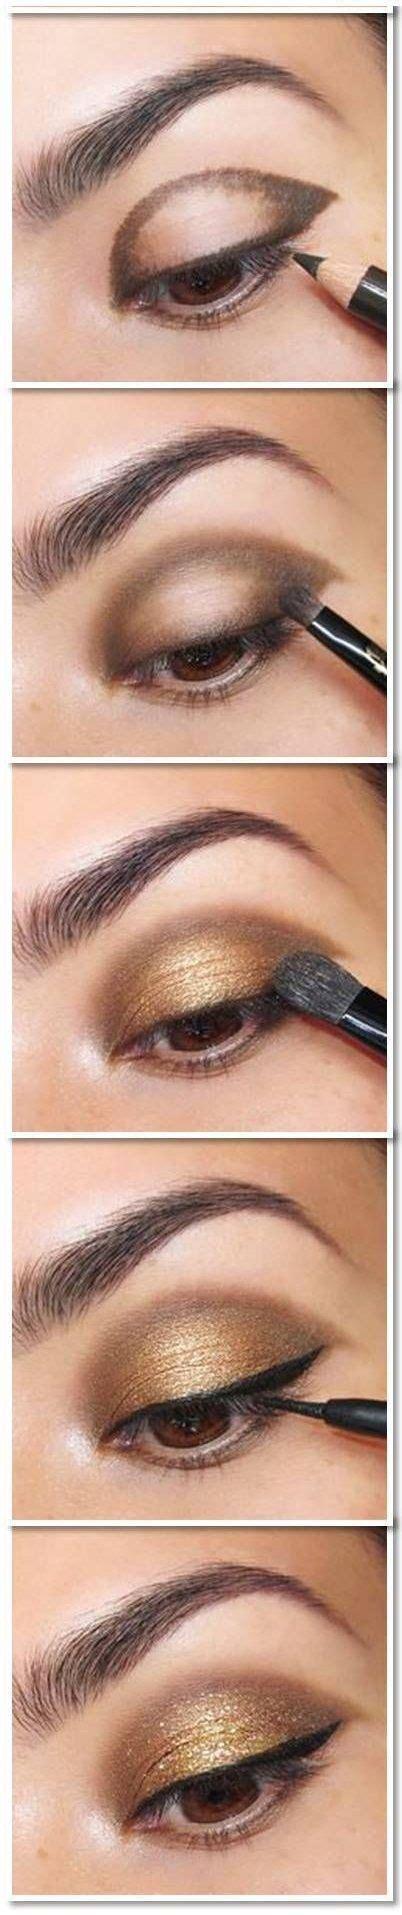 natural eye makeup tutorial mac 10 gold smoky eye tutorials for fall eyeshadow tutorials